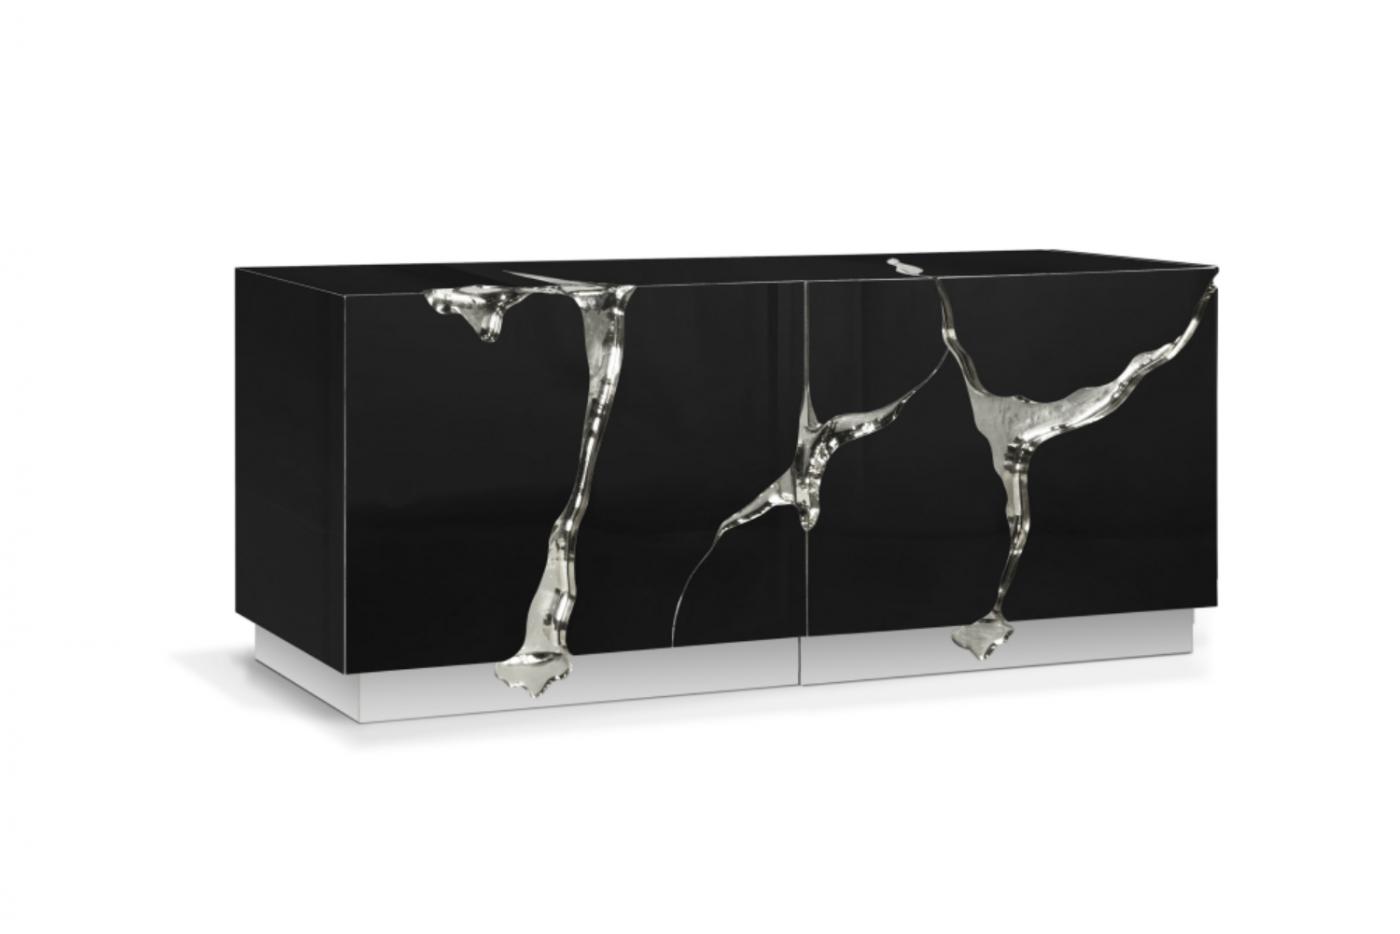 modern furniture Lapiaz in Black, A Wicked Modern Furniture Creation Lapiaz in Black A Wicked Furniture Creation feature 1400x934